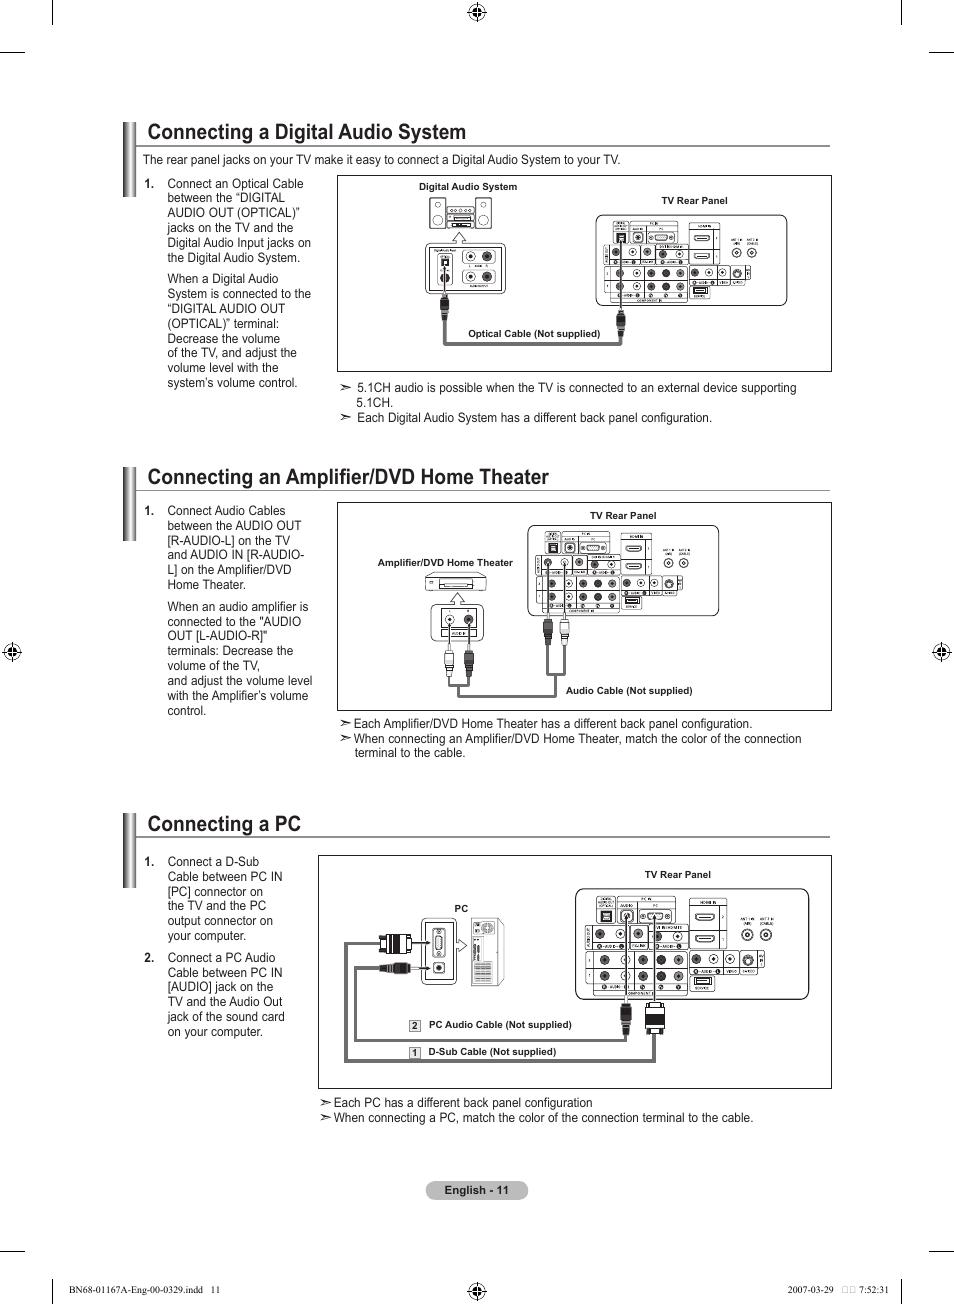 samsung fernseher optical audio digital